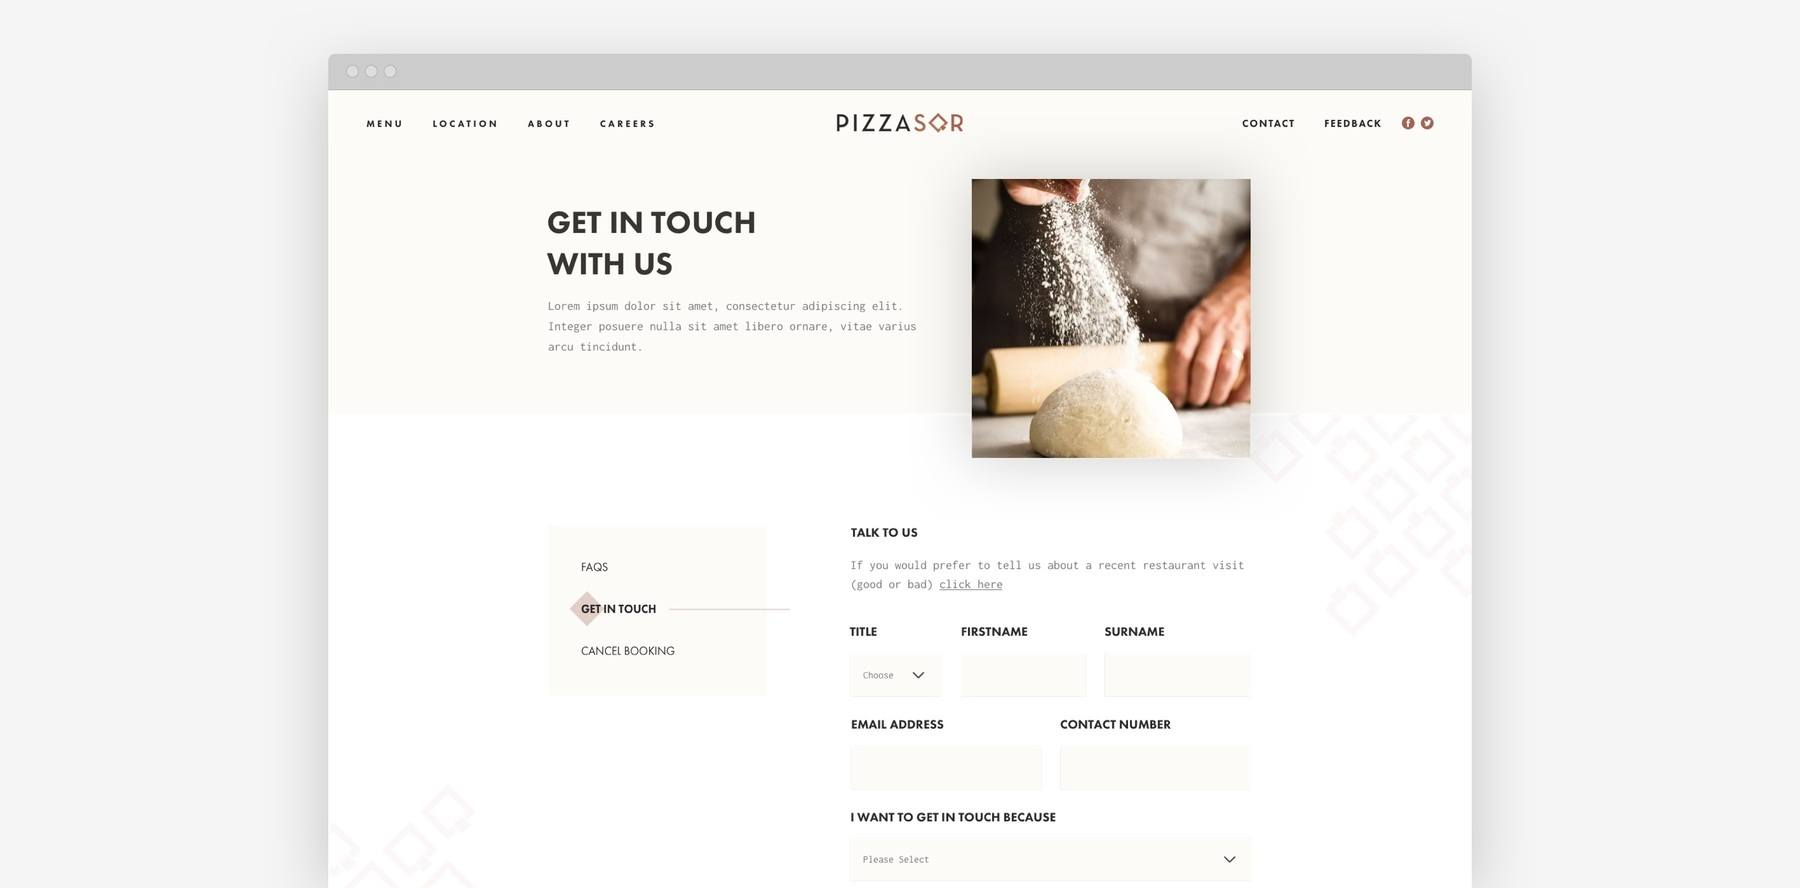 PizzaSQR - Get In Touch